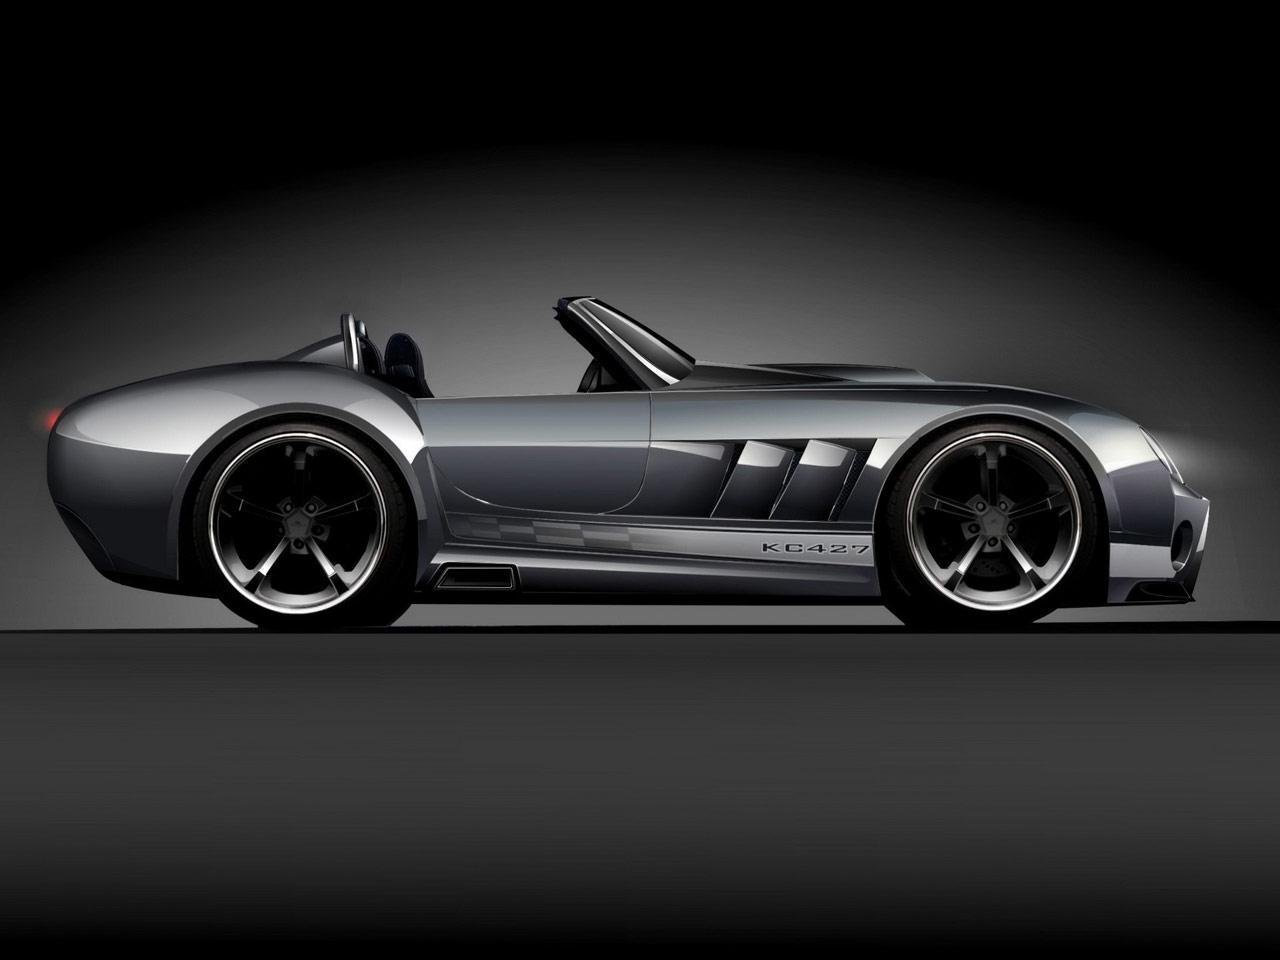 auto kobra wechselstrom 740 neues auto produkt id. Black Bedroom Furniture Sets. Home Design Ideas